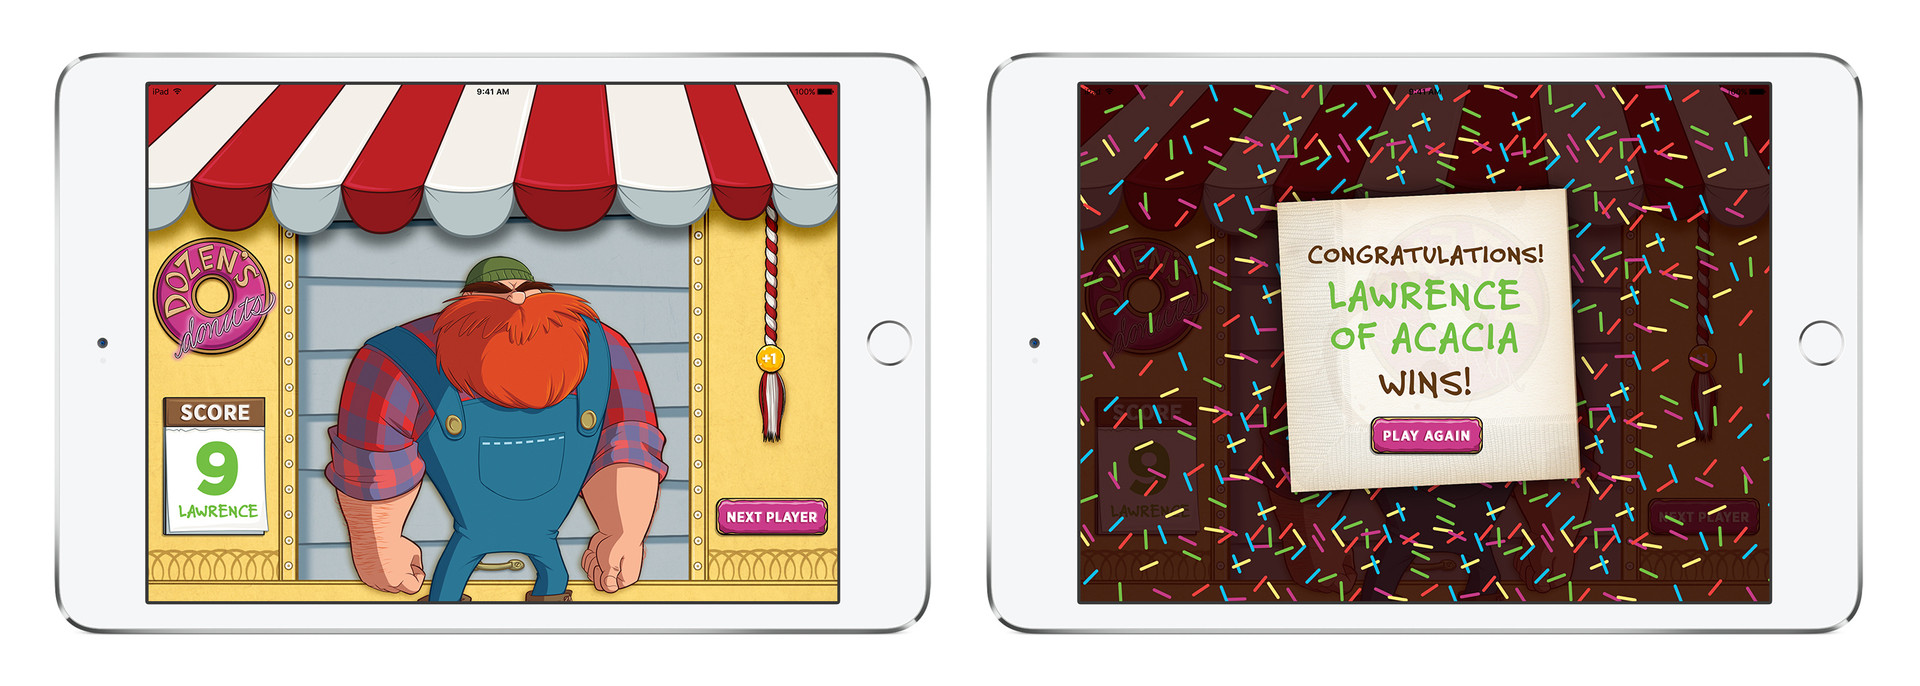 App Scoring Screen & Winning Screen